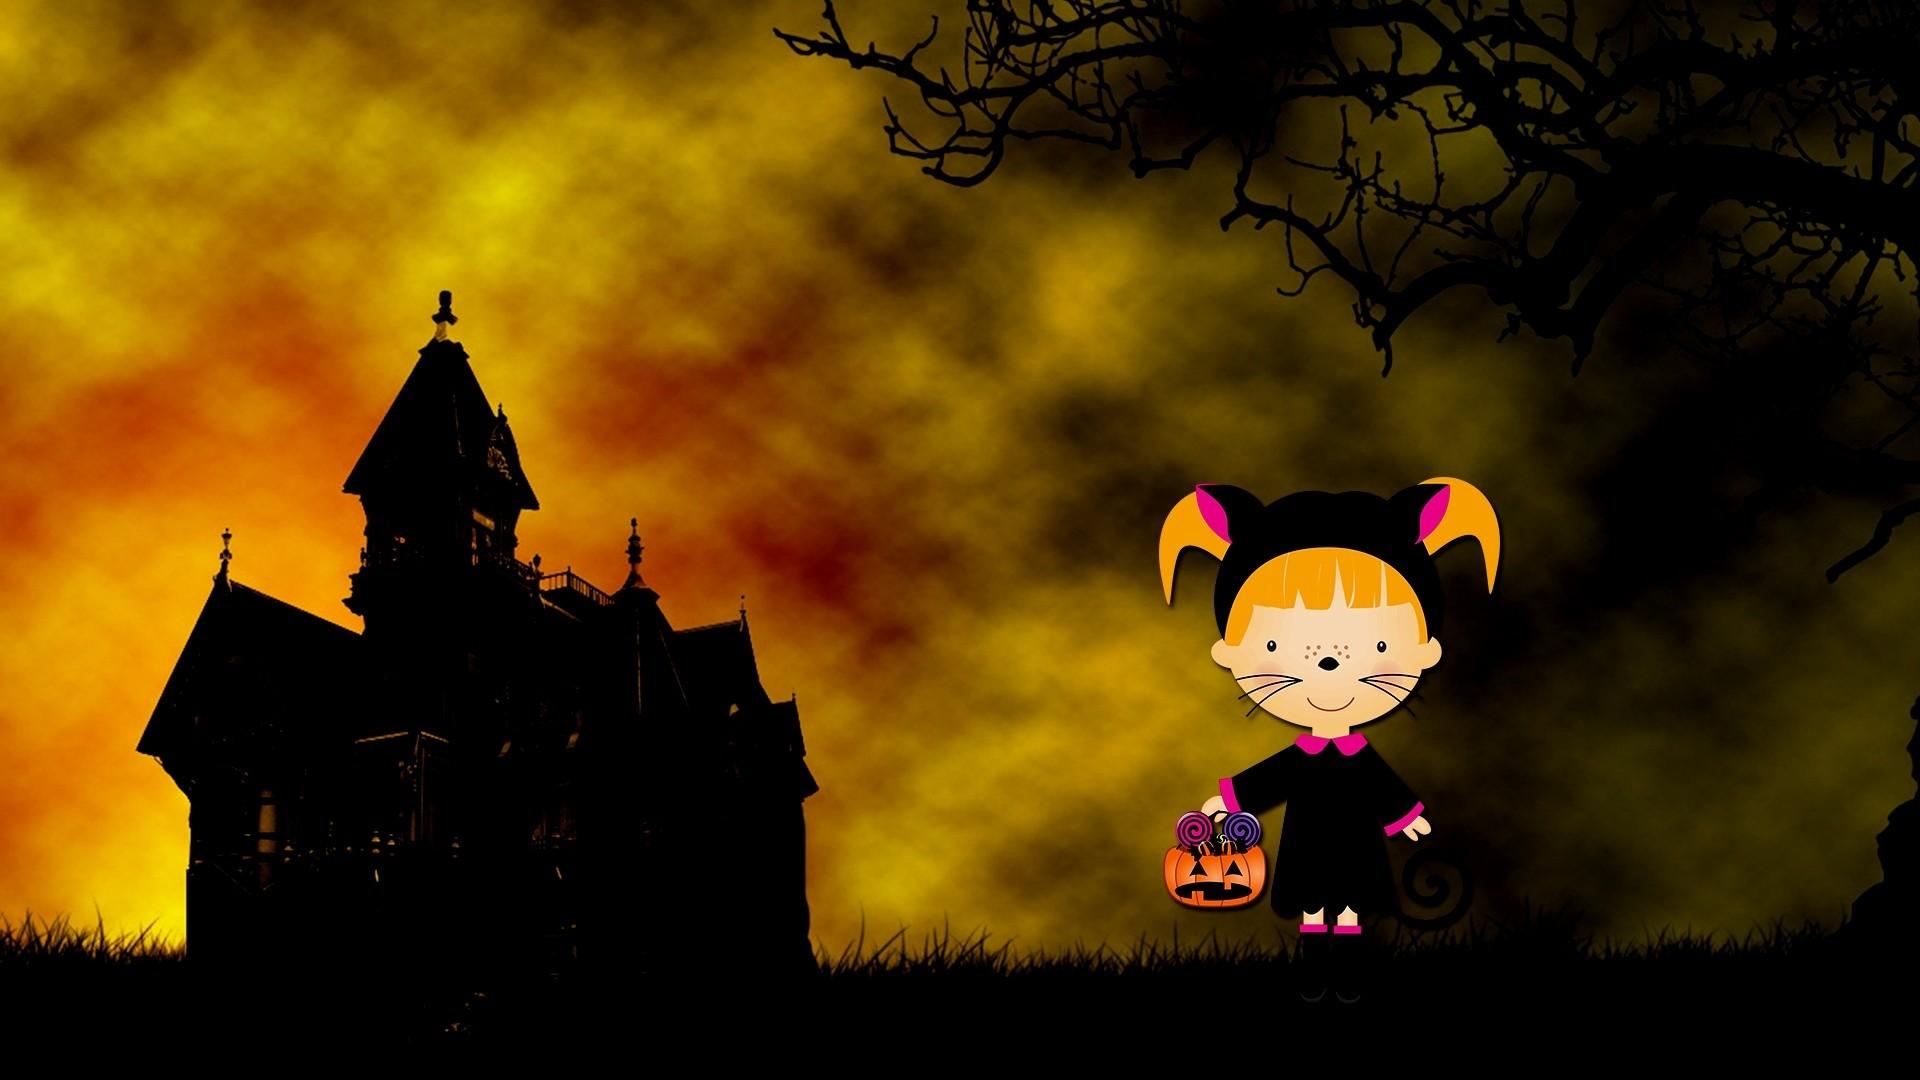 Halloween 2020 hd desktop wallpaper